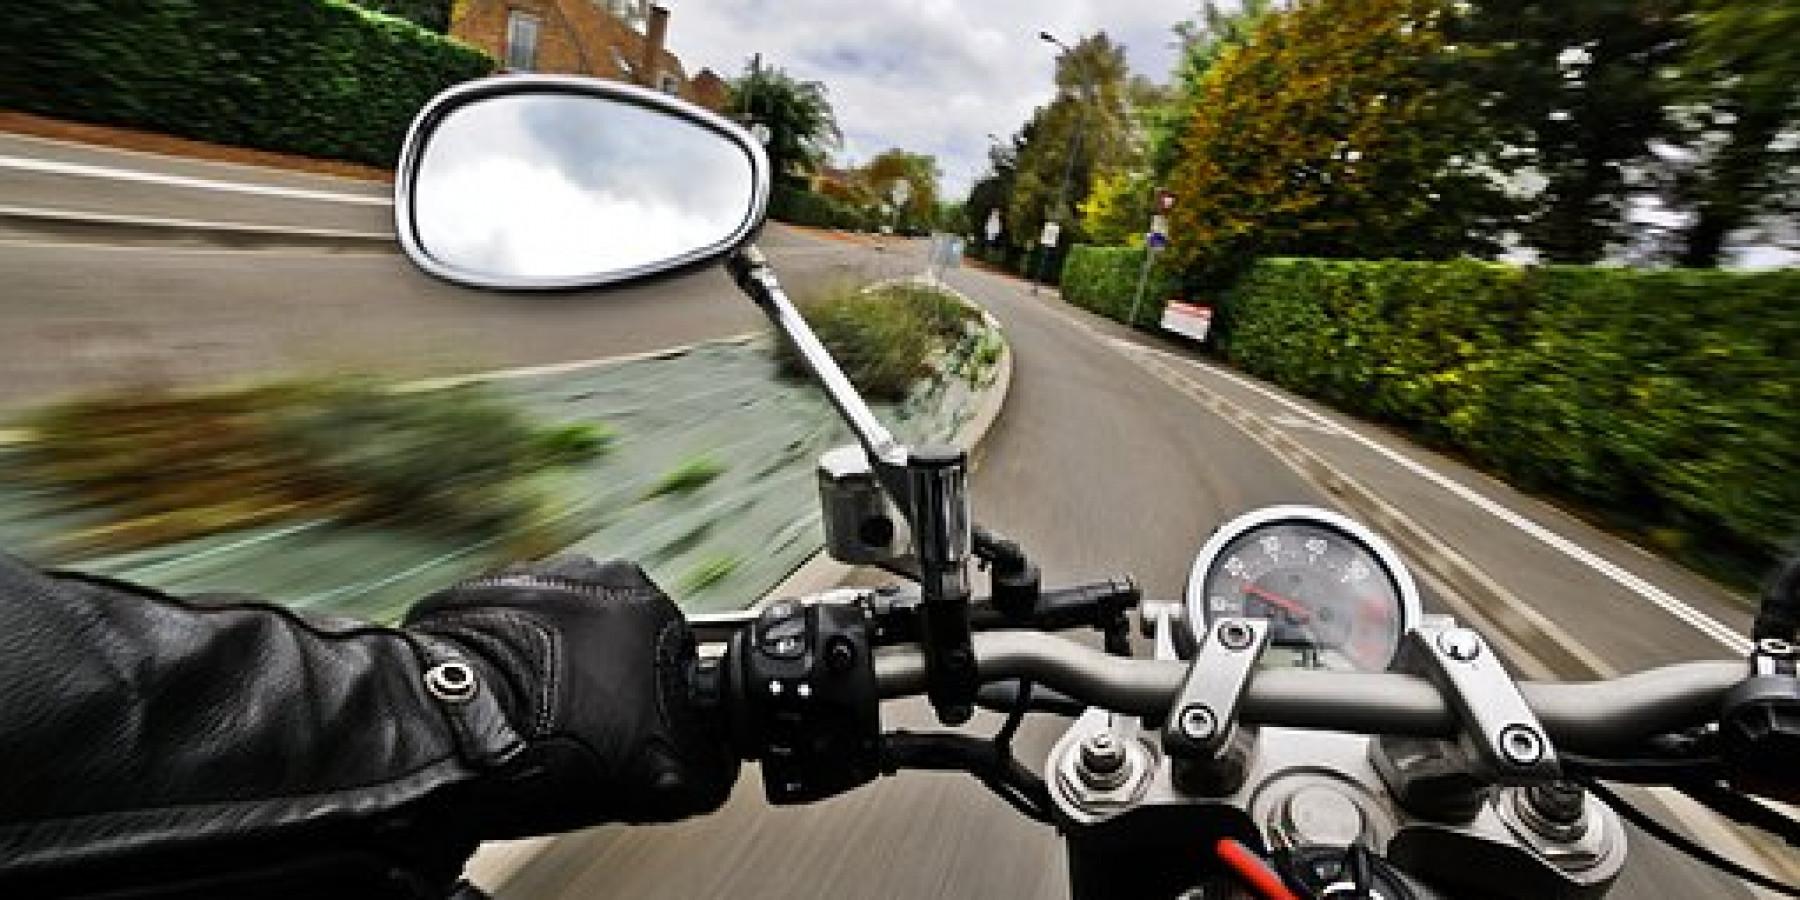 Motorisierte Zweiräder in Berg Fidel entwendet